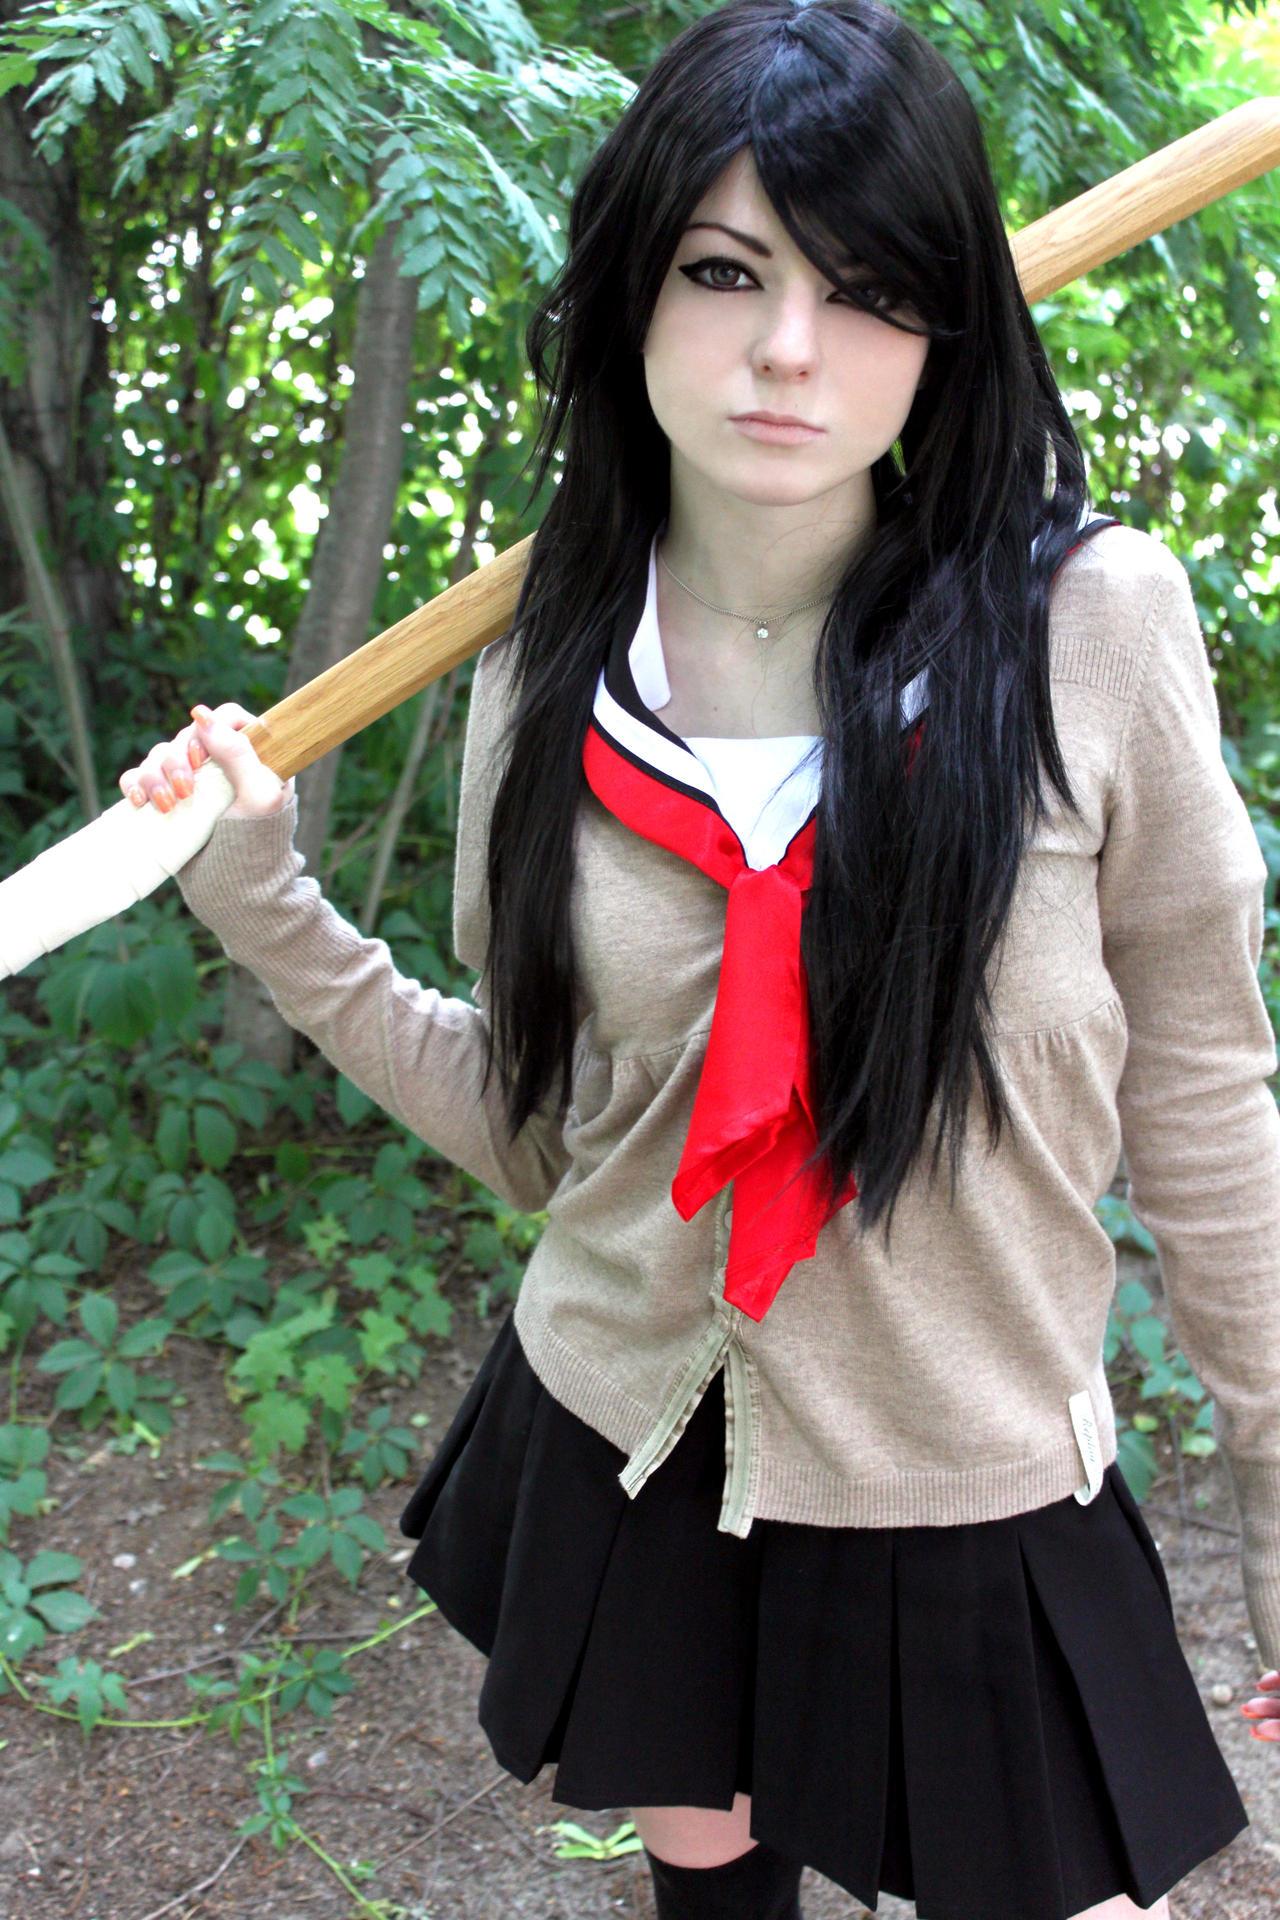 Japanese schoolgirl by Melissa-Lissova on DeviantArt